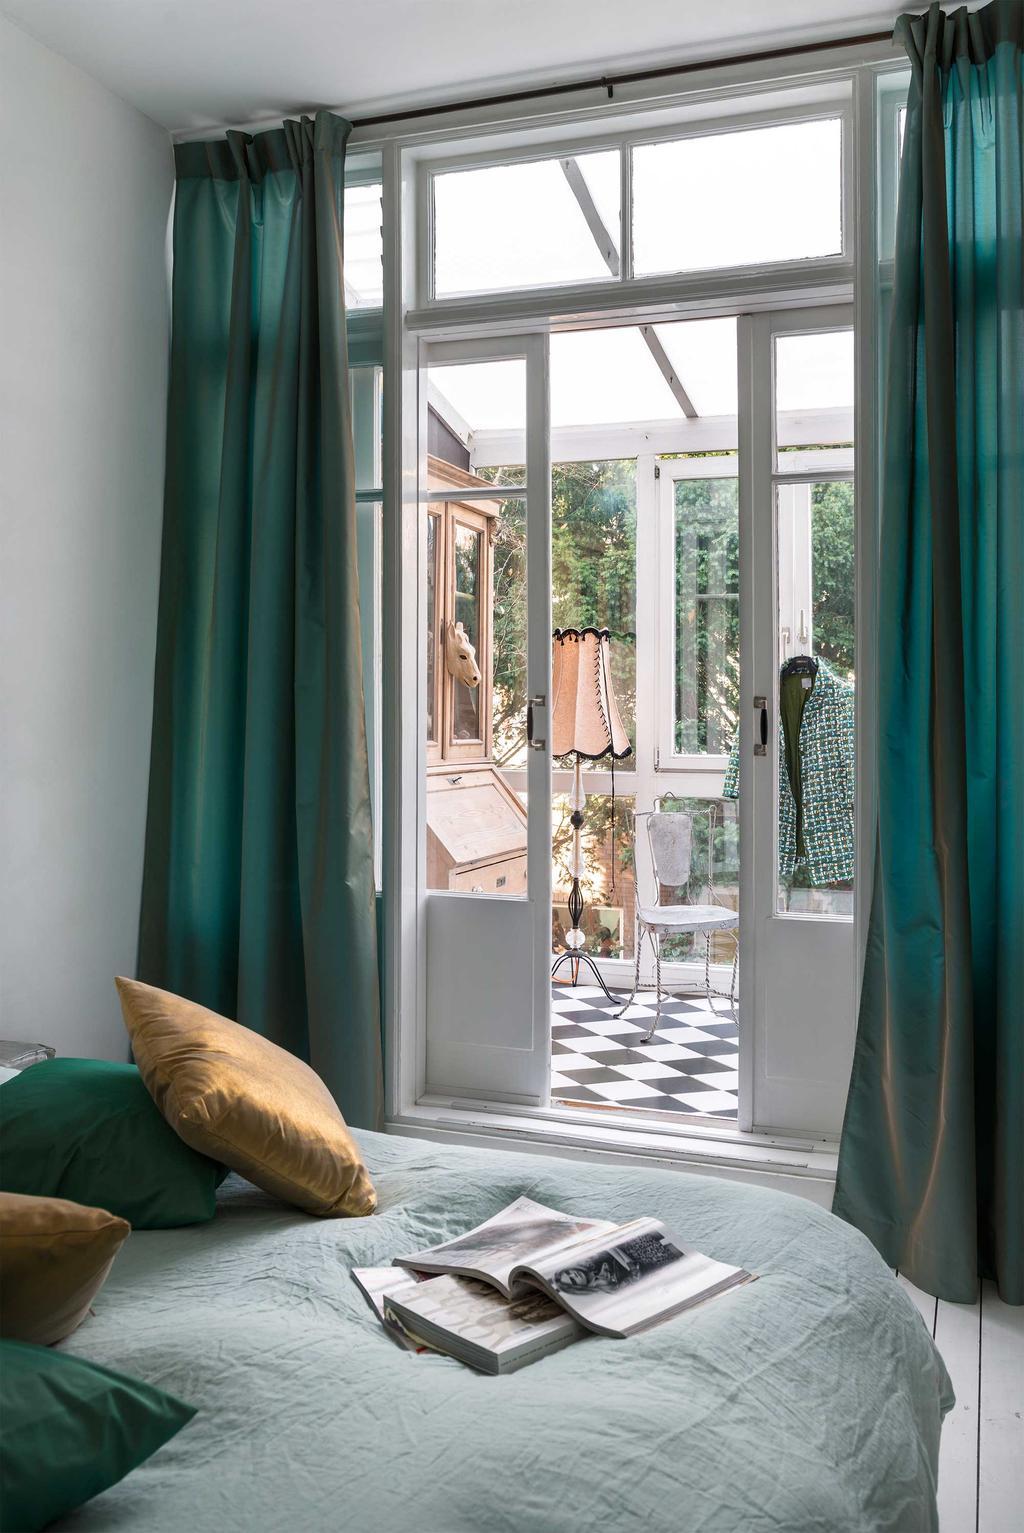 slaapkamer groene gordijnen serre